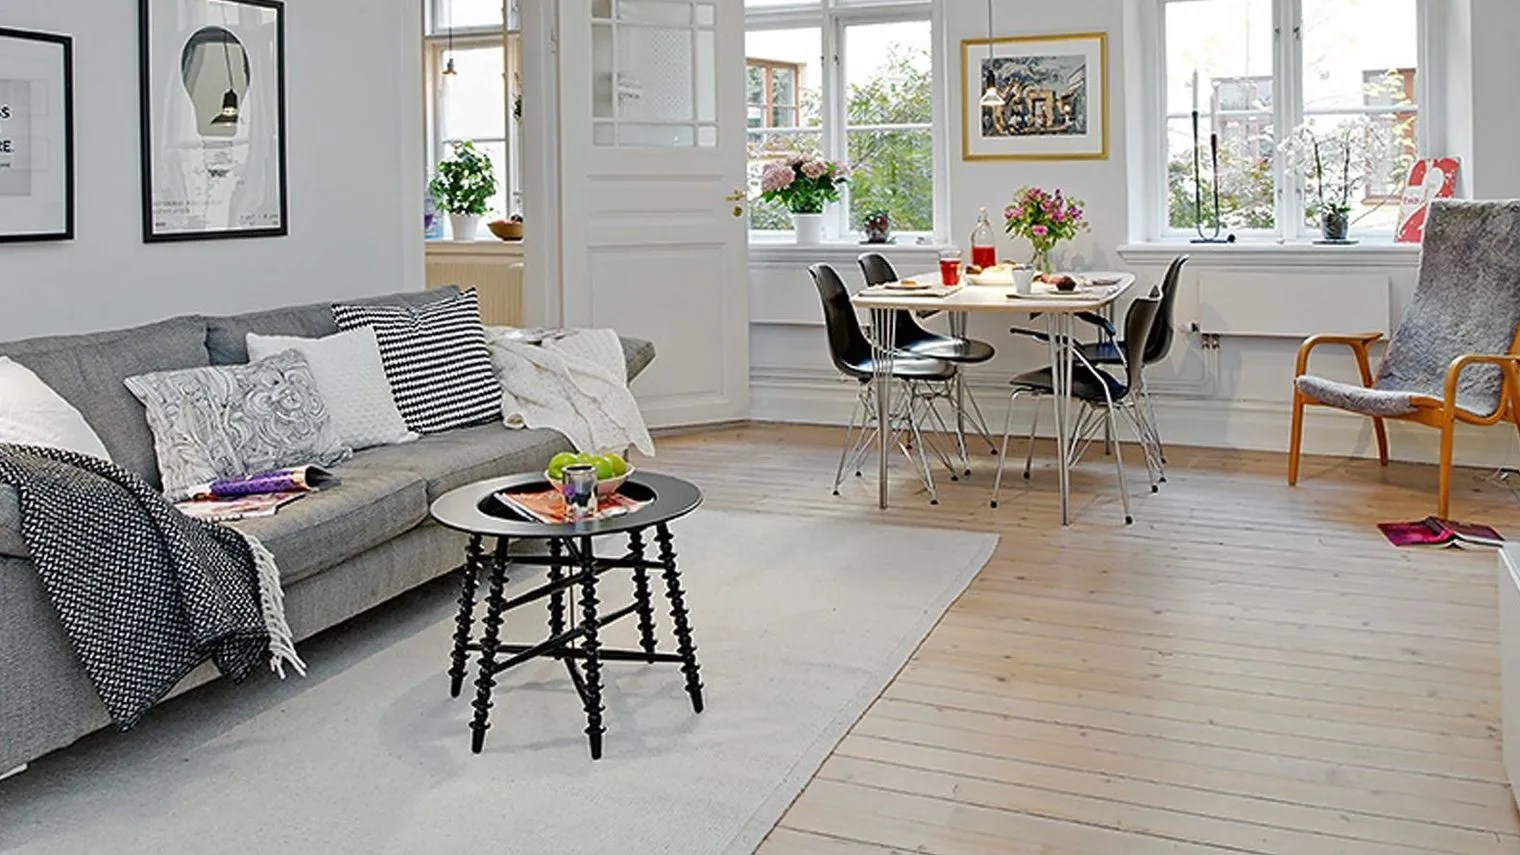 Deco Maison Style Scandinave PH03 Jornalagora